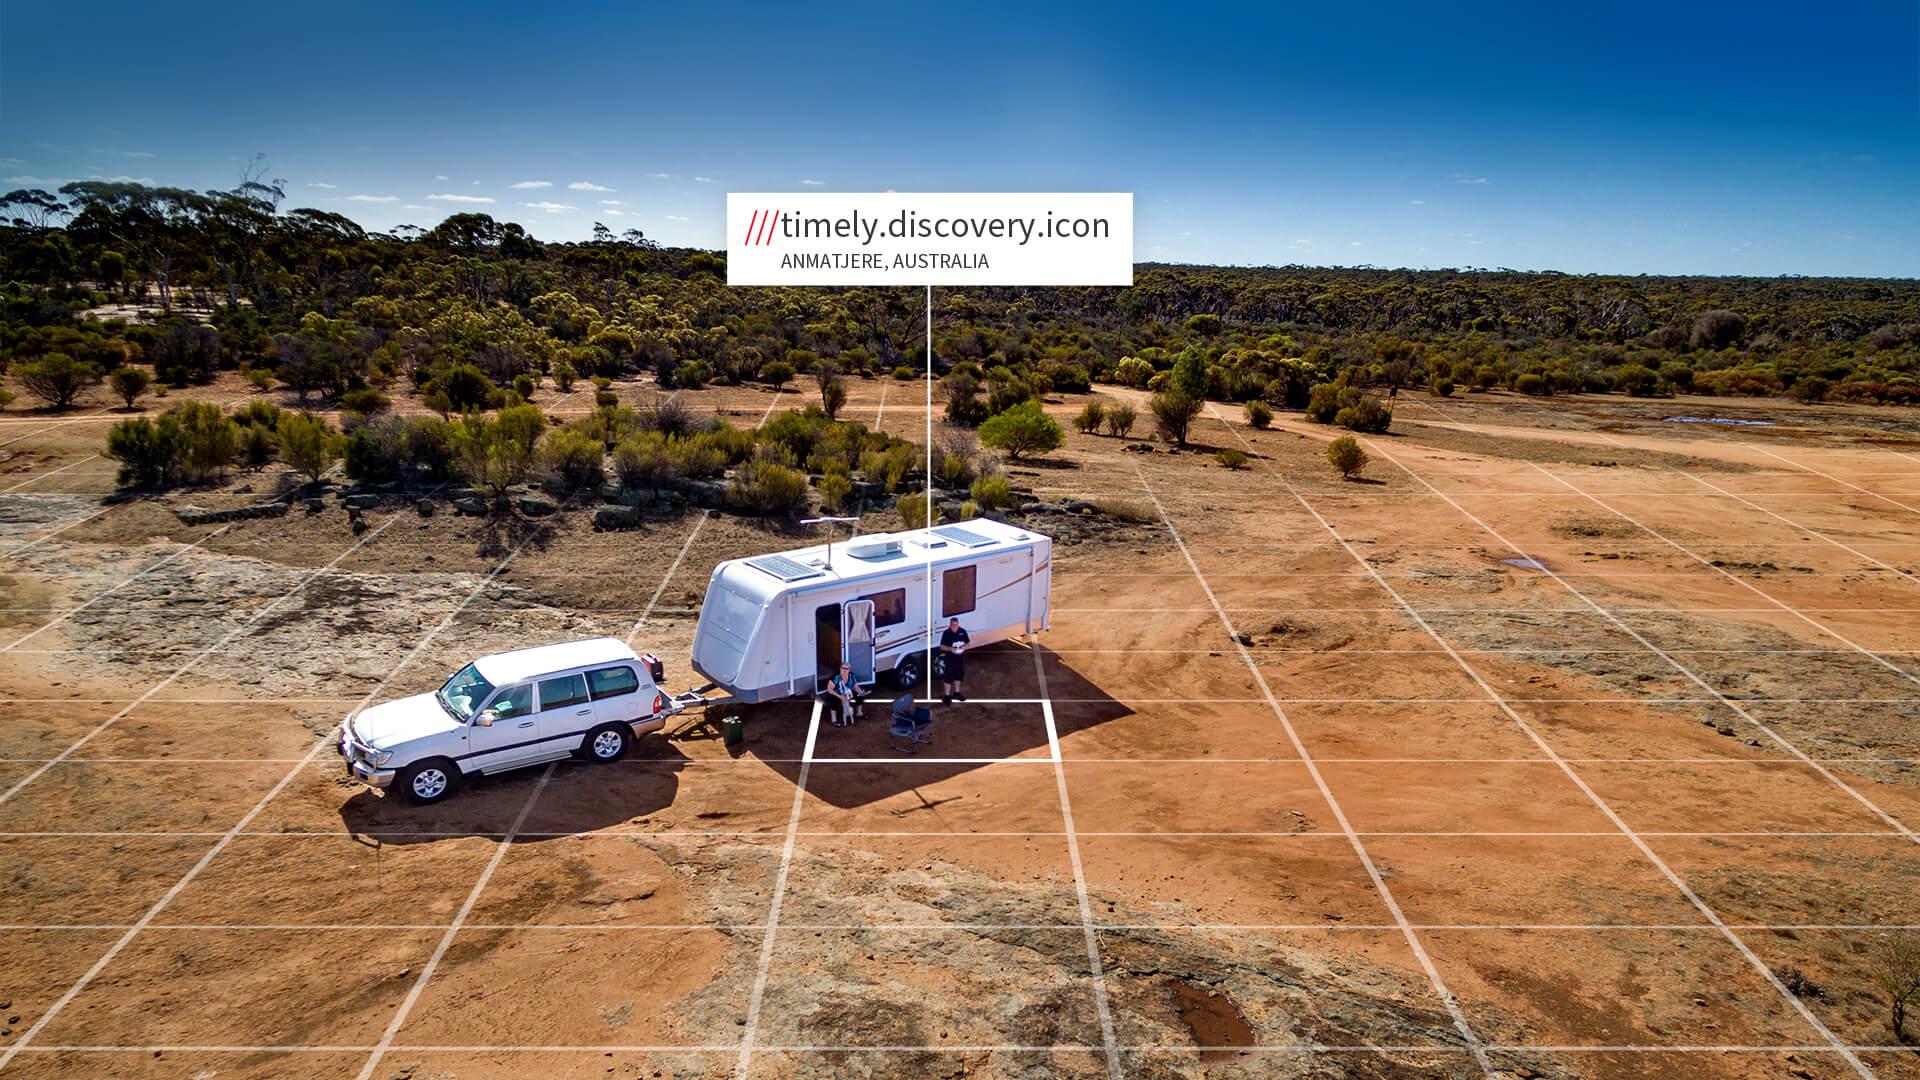 Caravan with what3words address in Australia